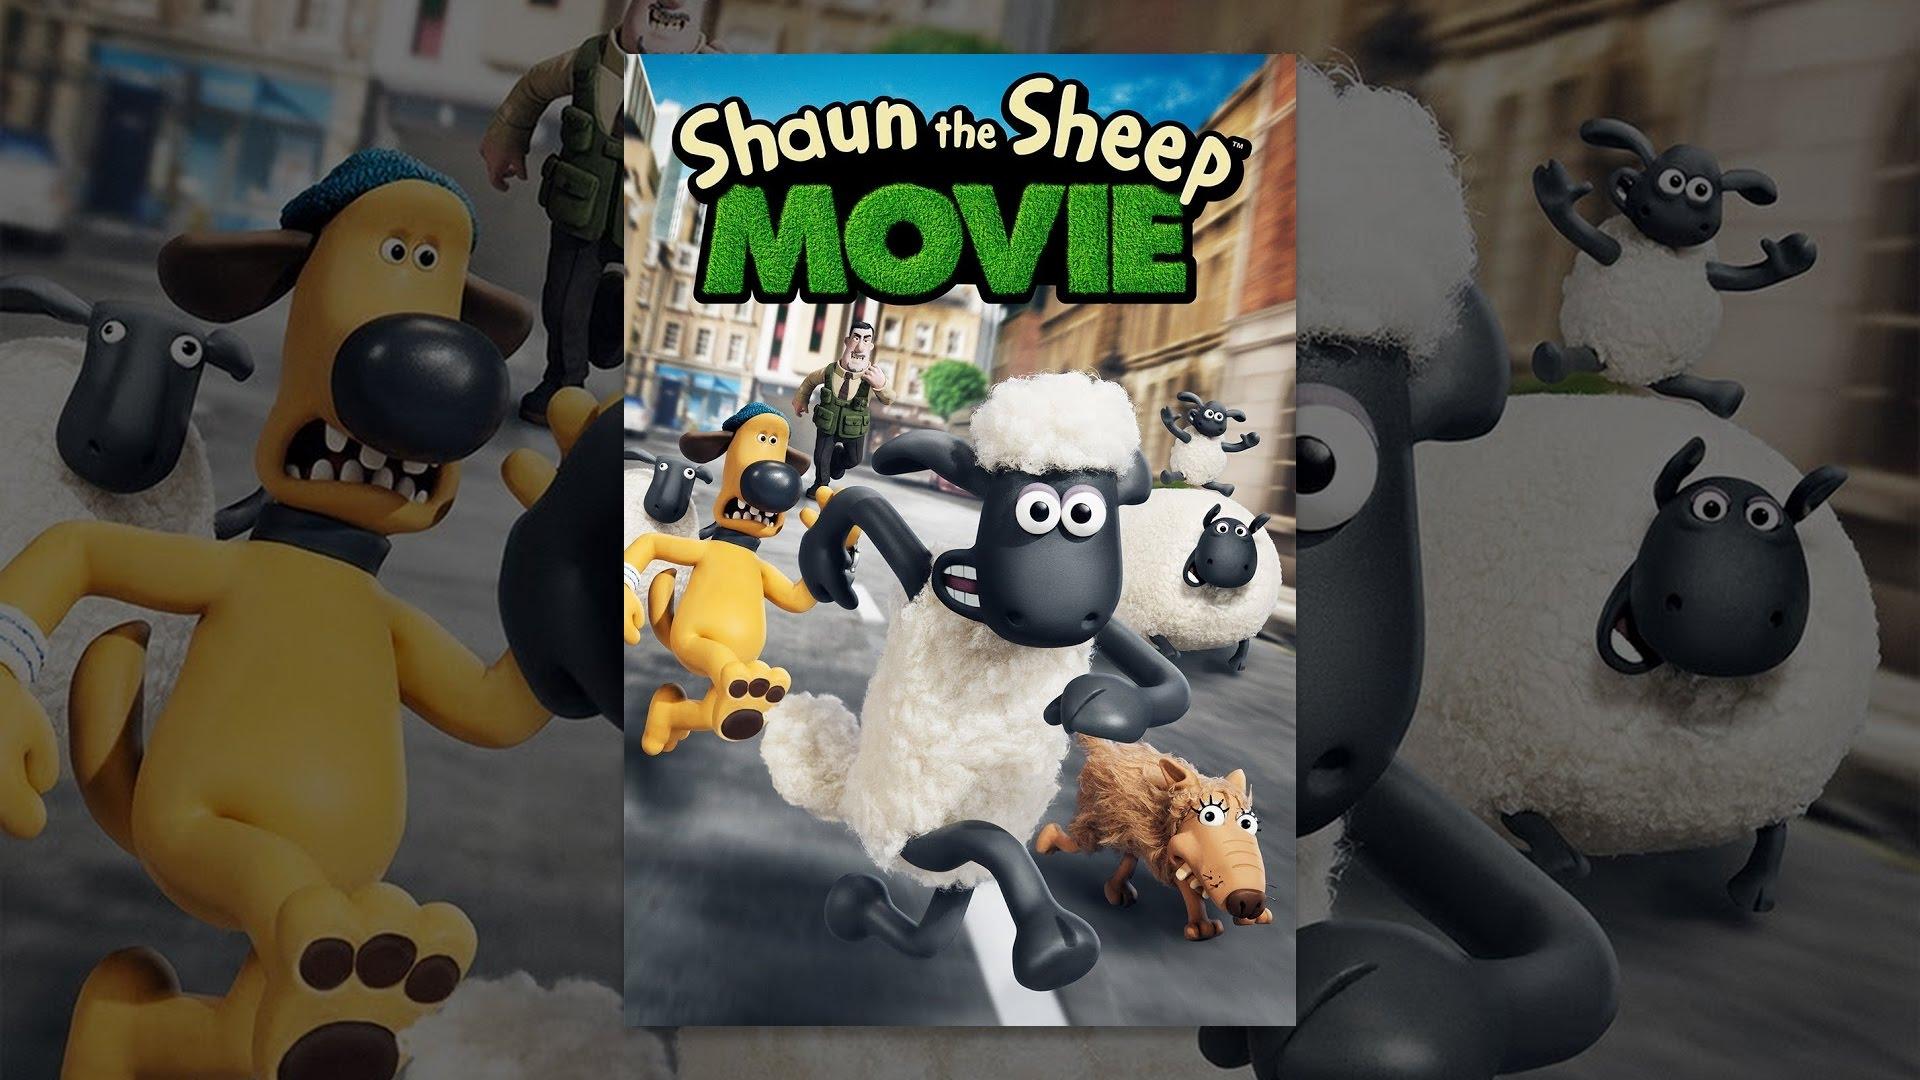 Shaun the Sheep Movie - YouTube